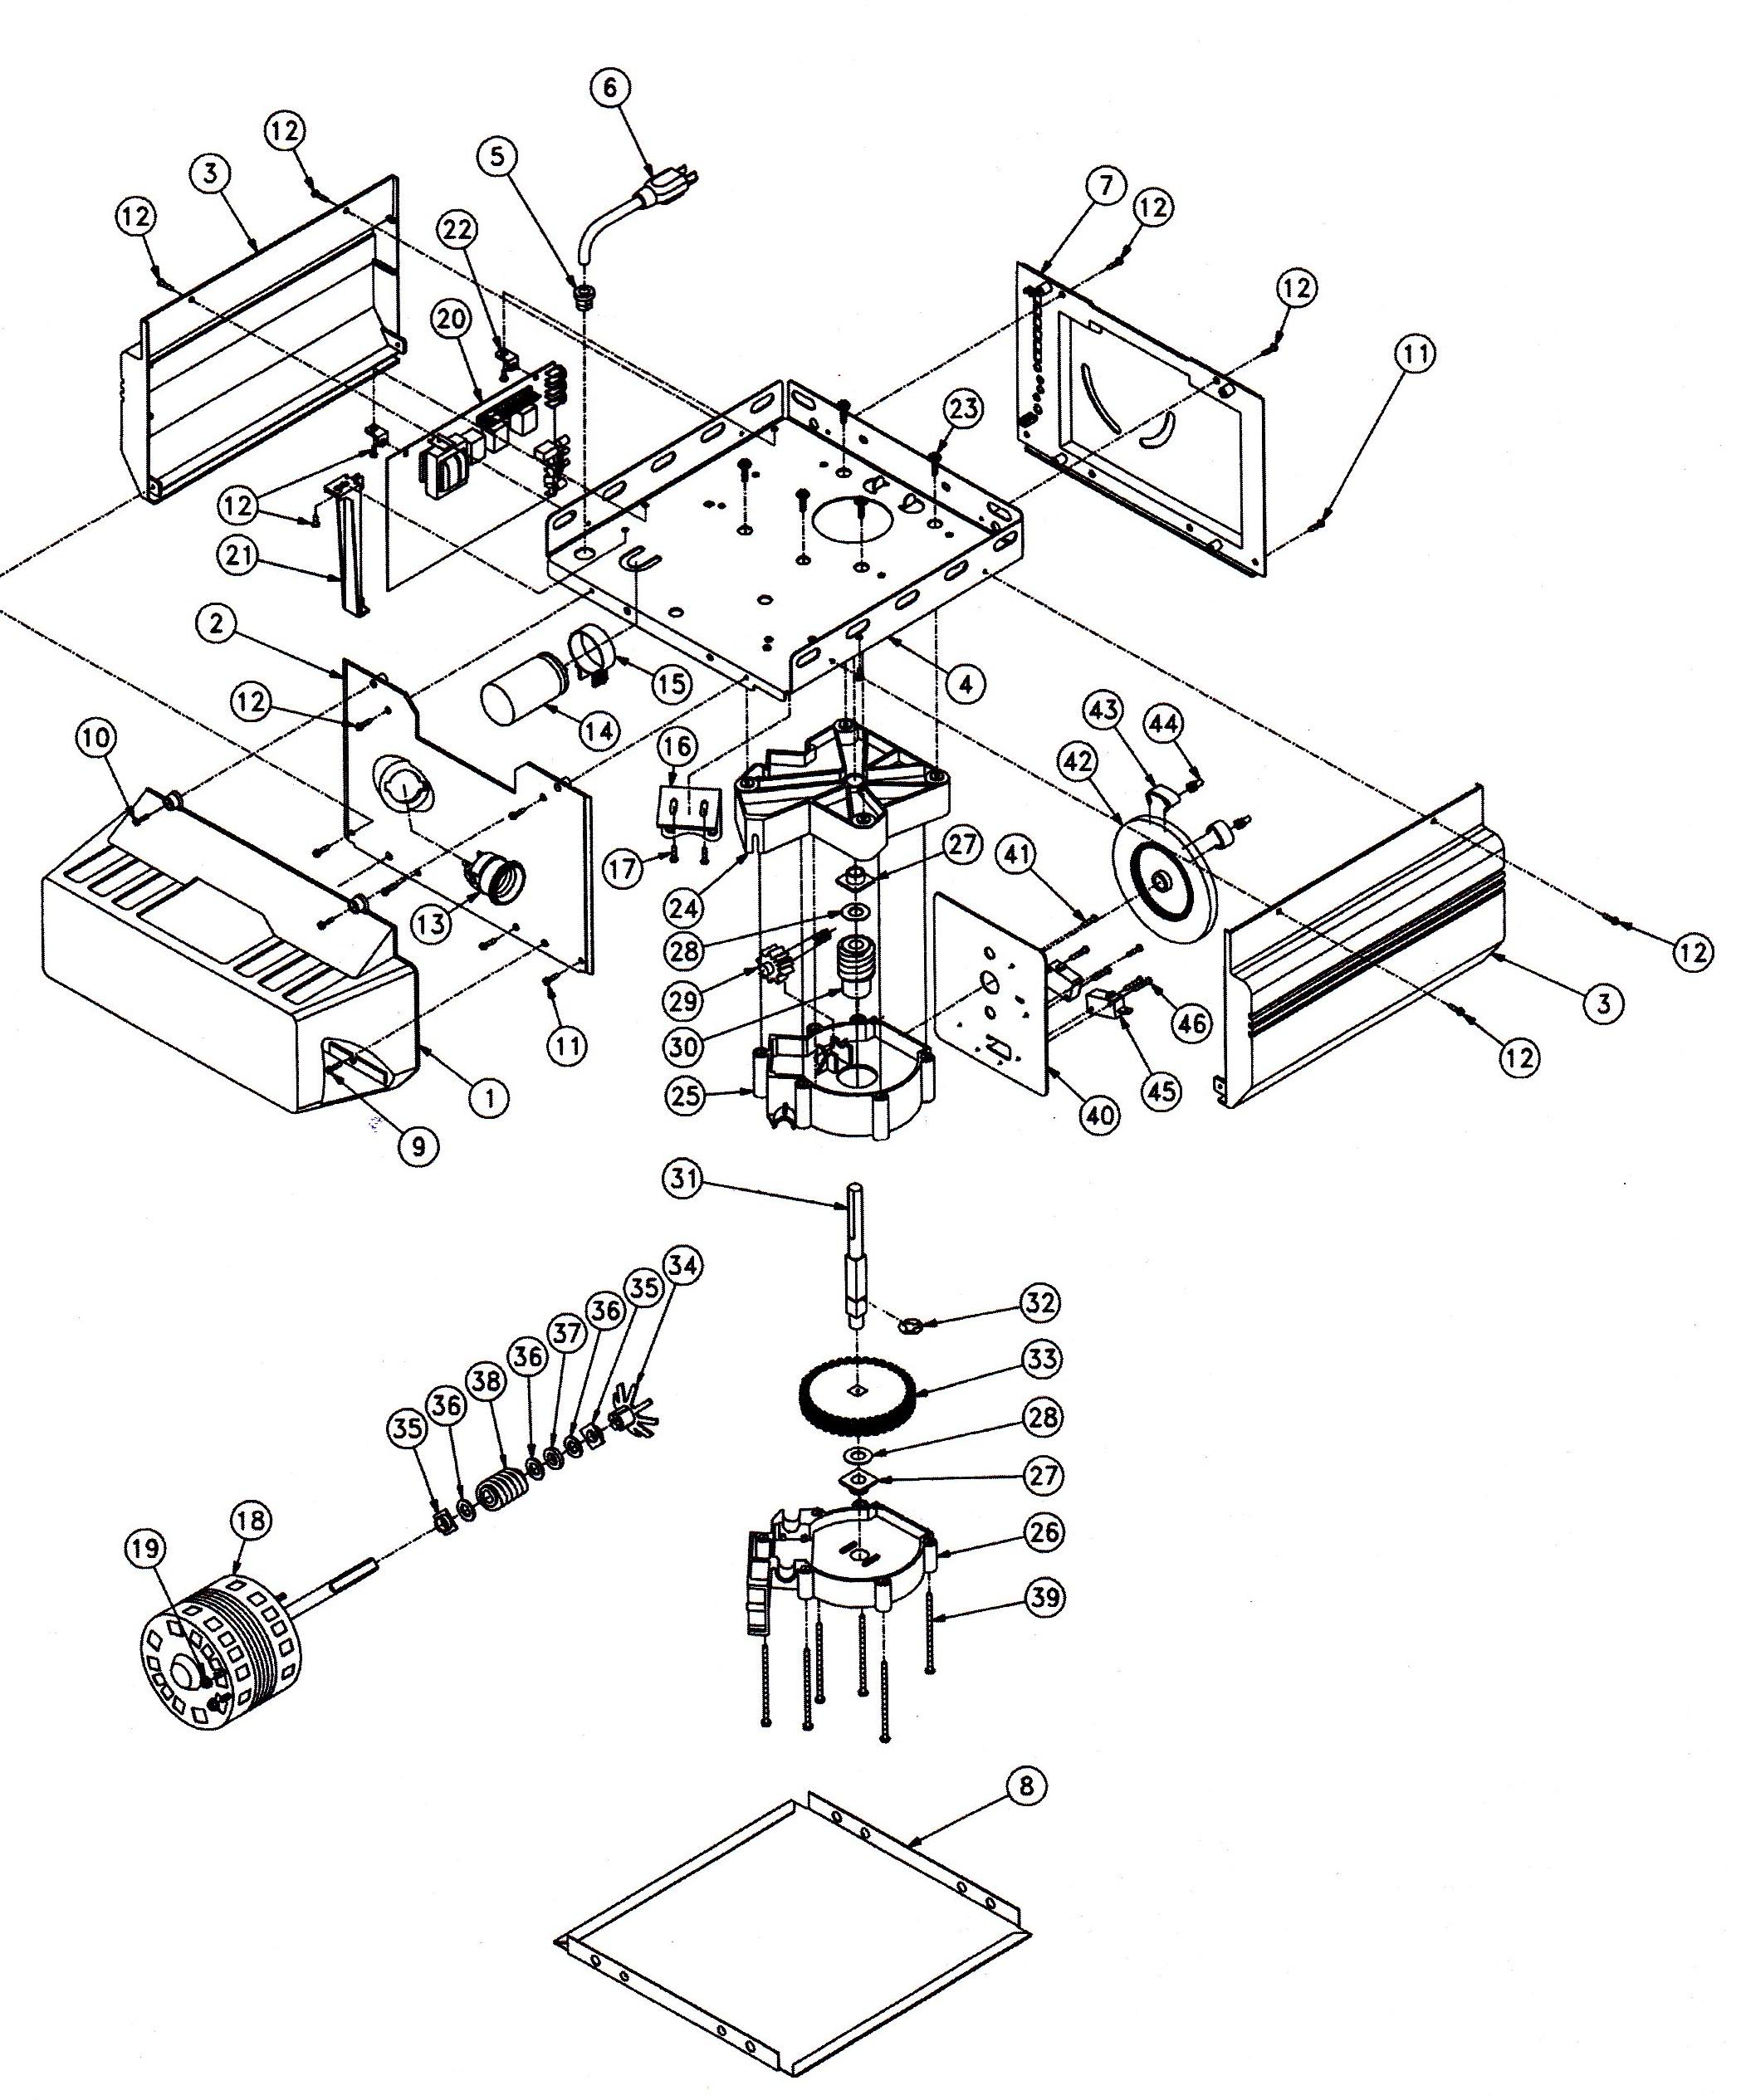 555 Ic Timer Circuit Diagram Free Download Wiring Diagram Schematic